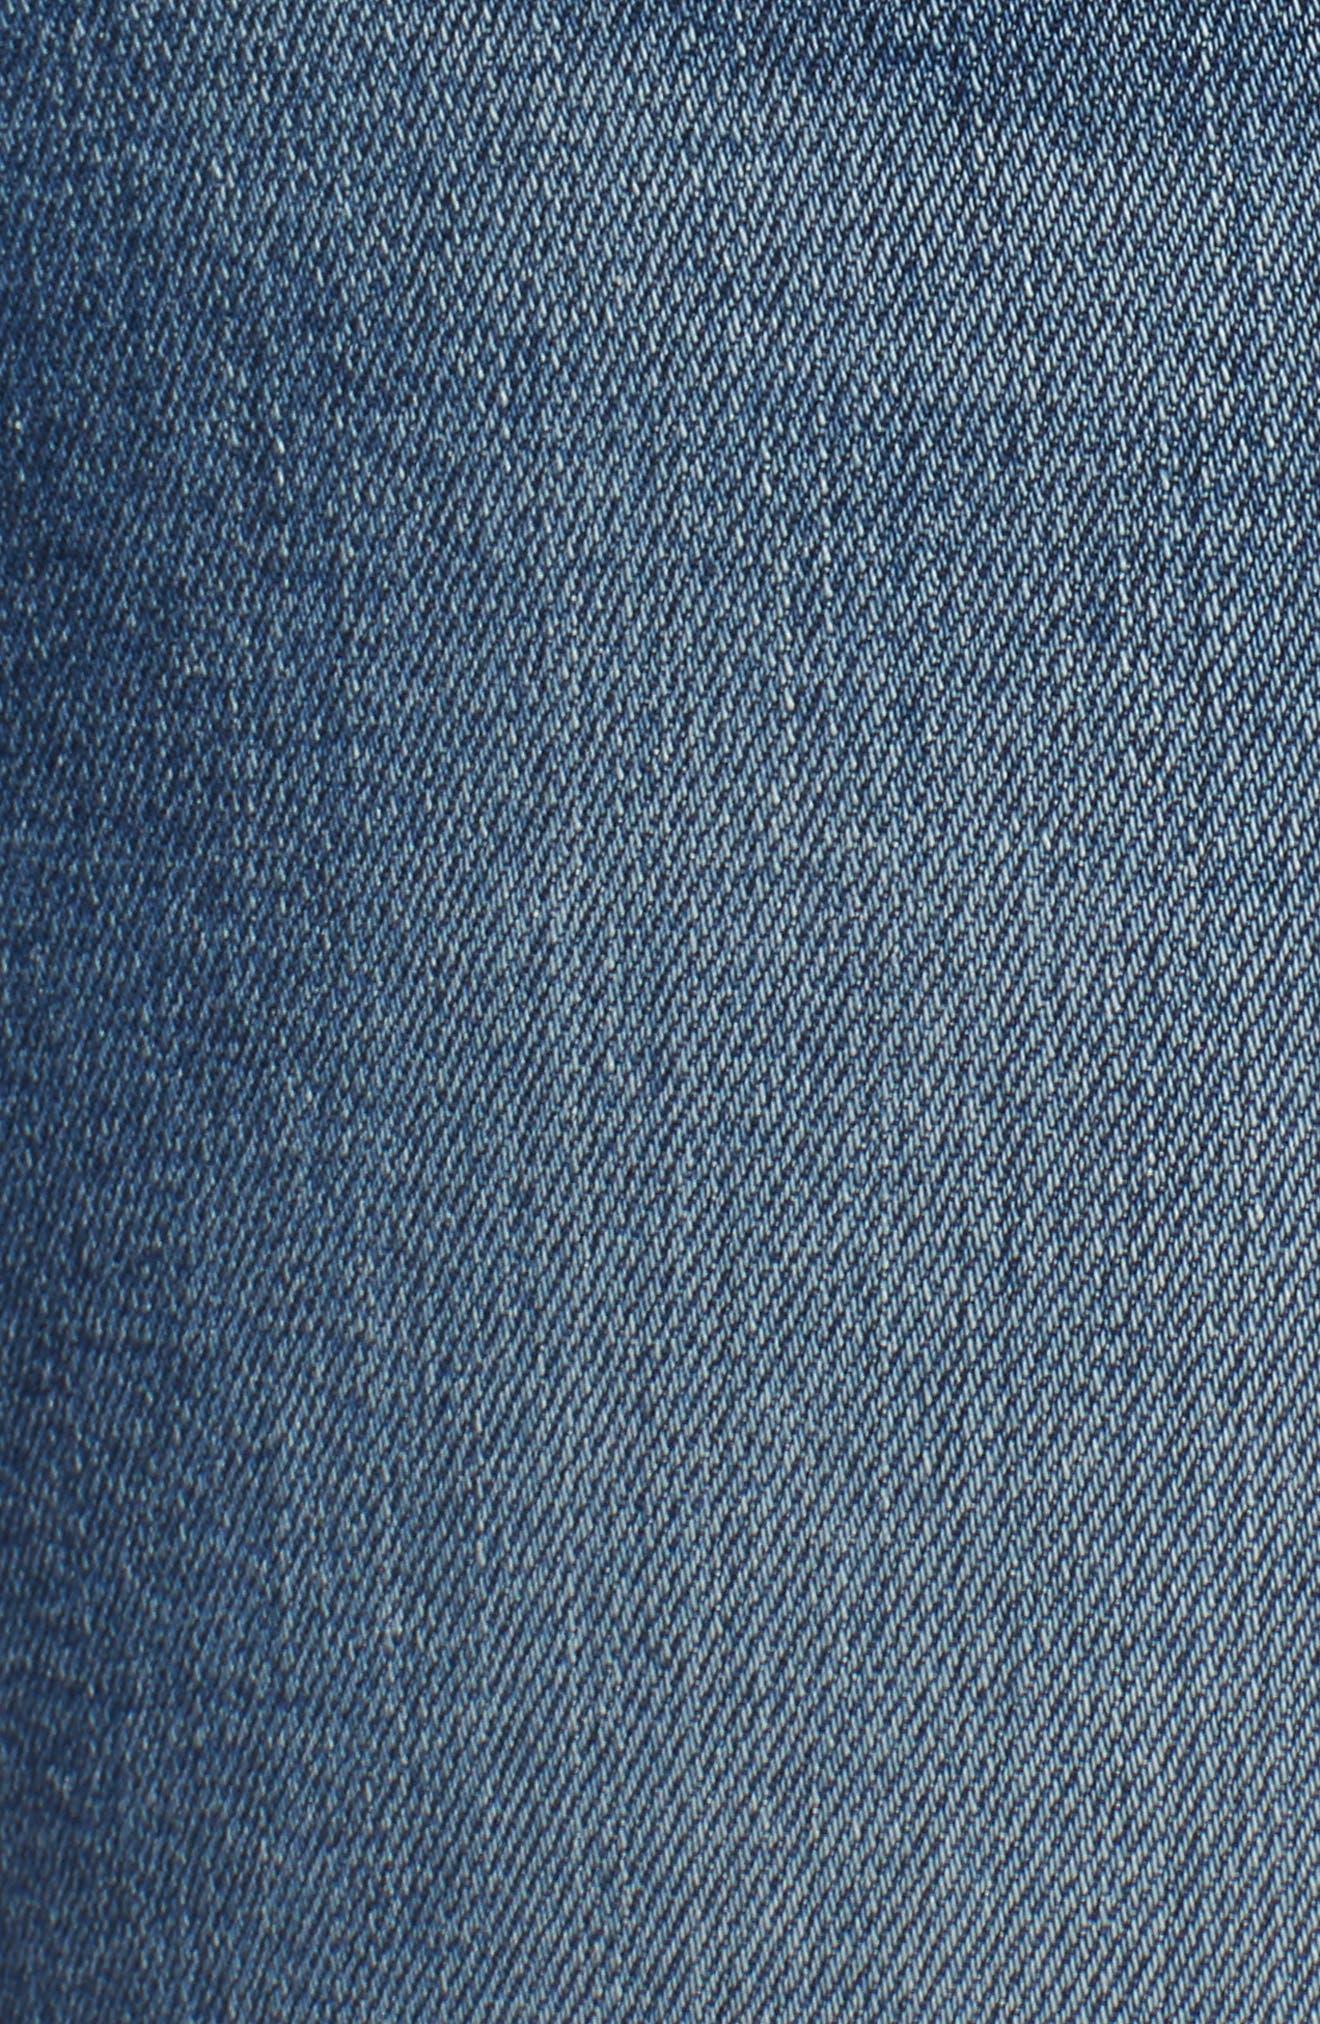 Cuffed Bermuda Denim Shorts,                             Alternate thumbnail 5, color,                             406